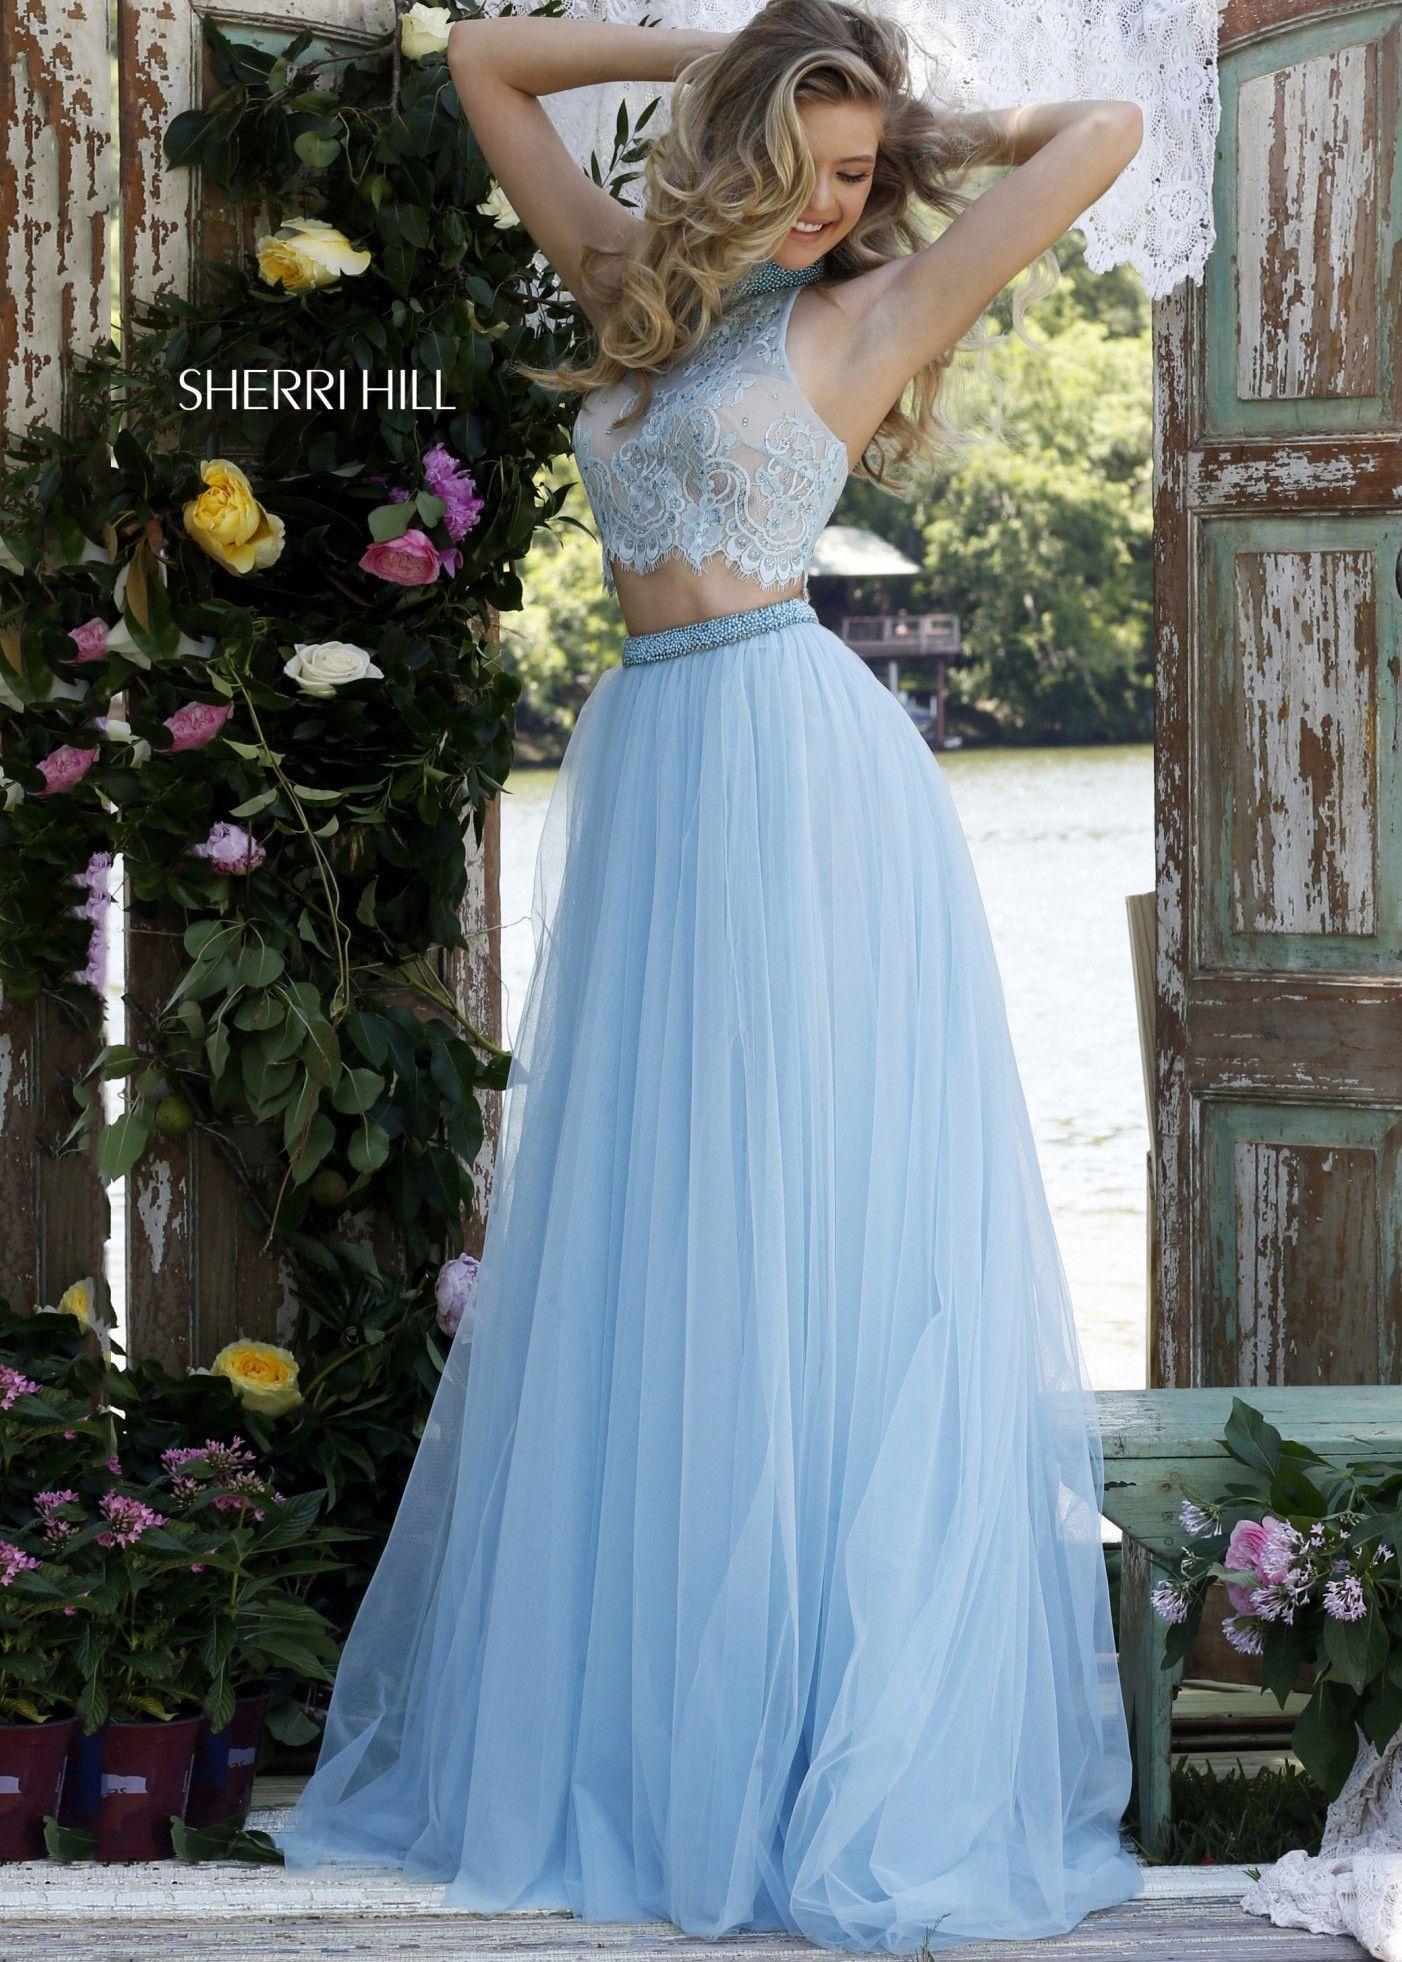 76bc4c86cdf85 Sherri Hill 32347 Light Blue Lovely Lace Crop Top 2 Piece Dress ...